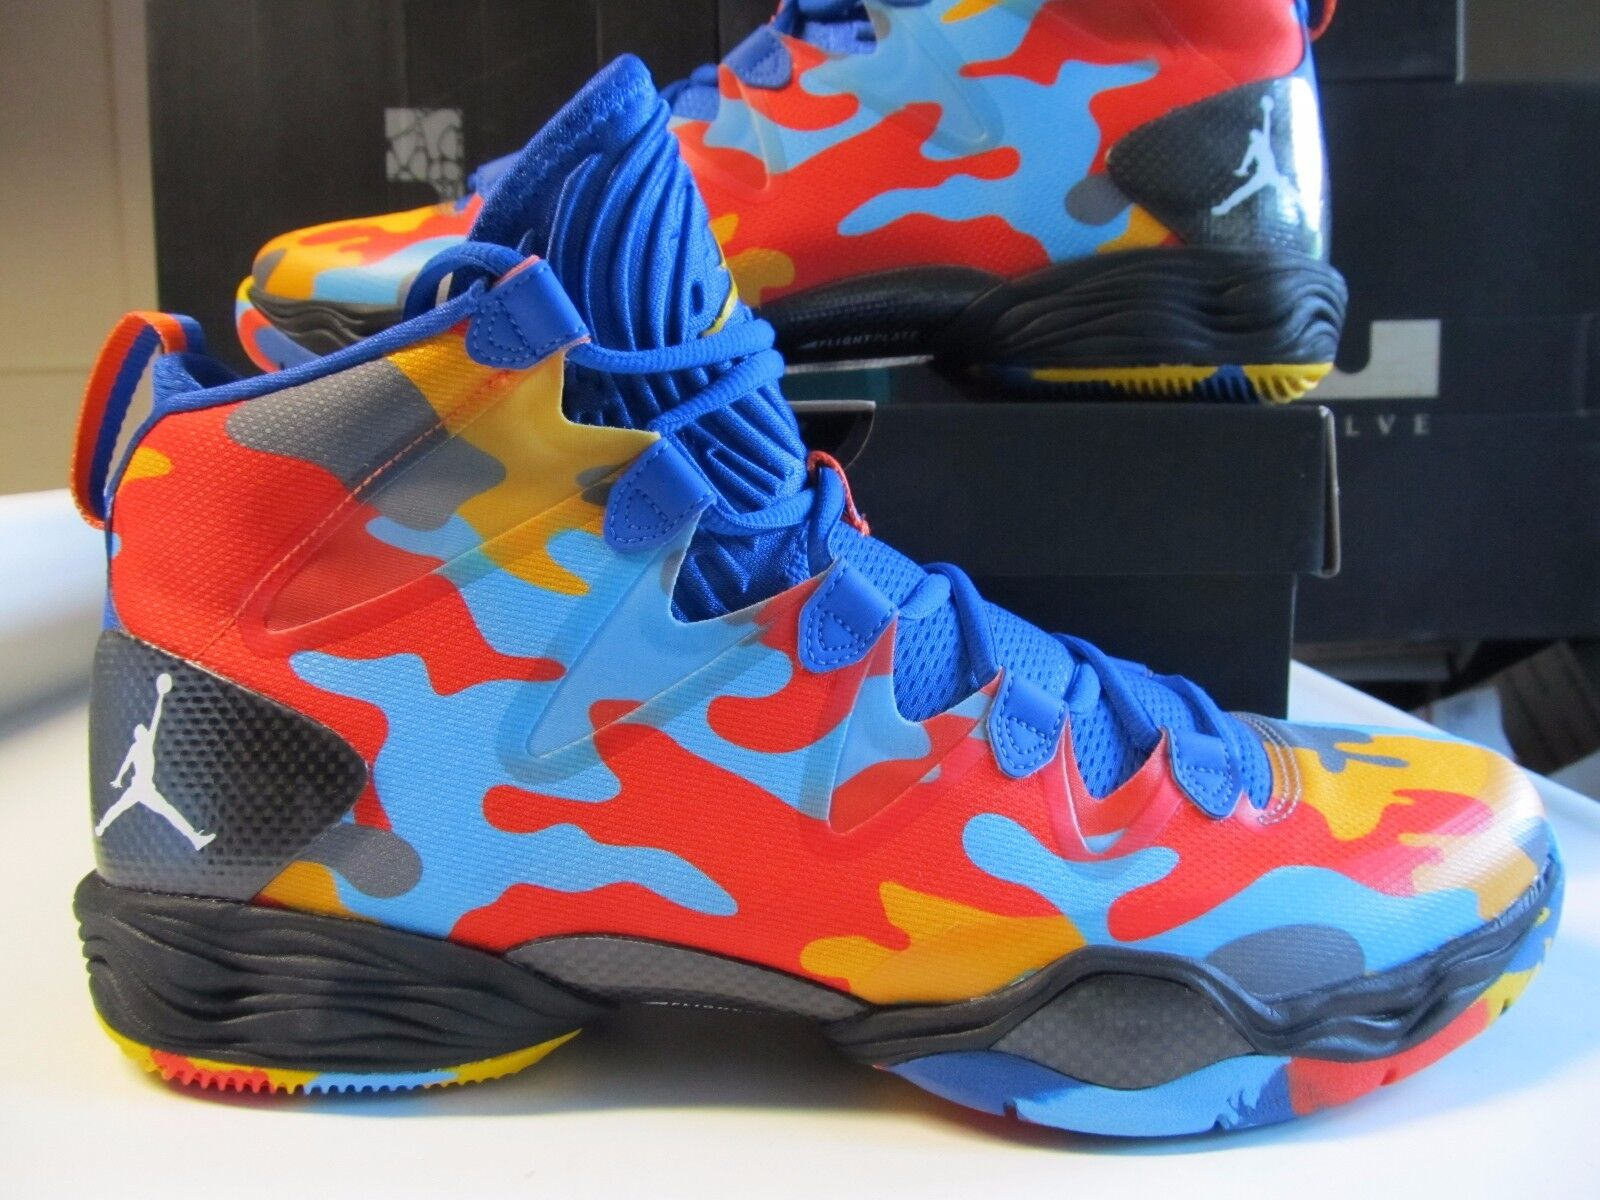 Nike Air Jordan XX8 SE CAMO Blue Org RUSSELL WESTBROOK 616345 450 28 okc thunder